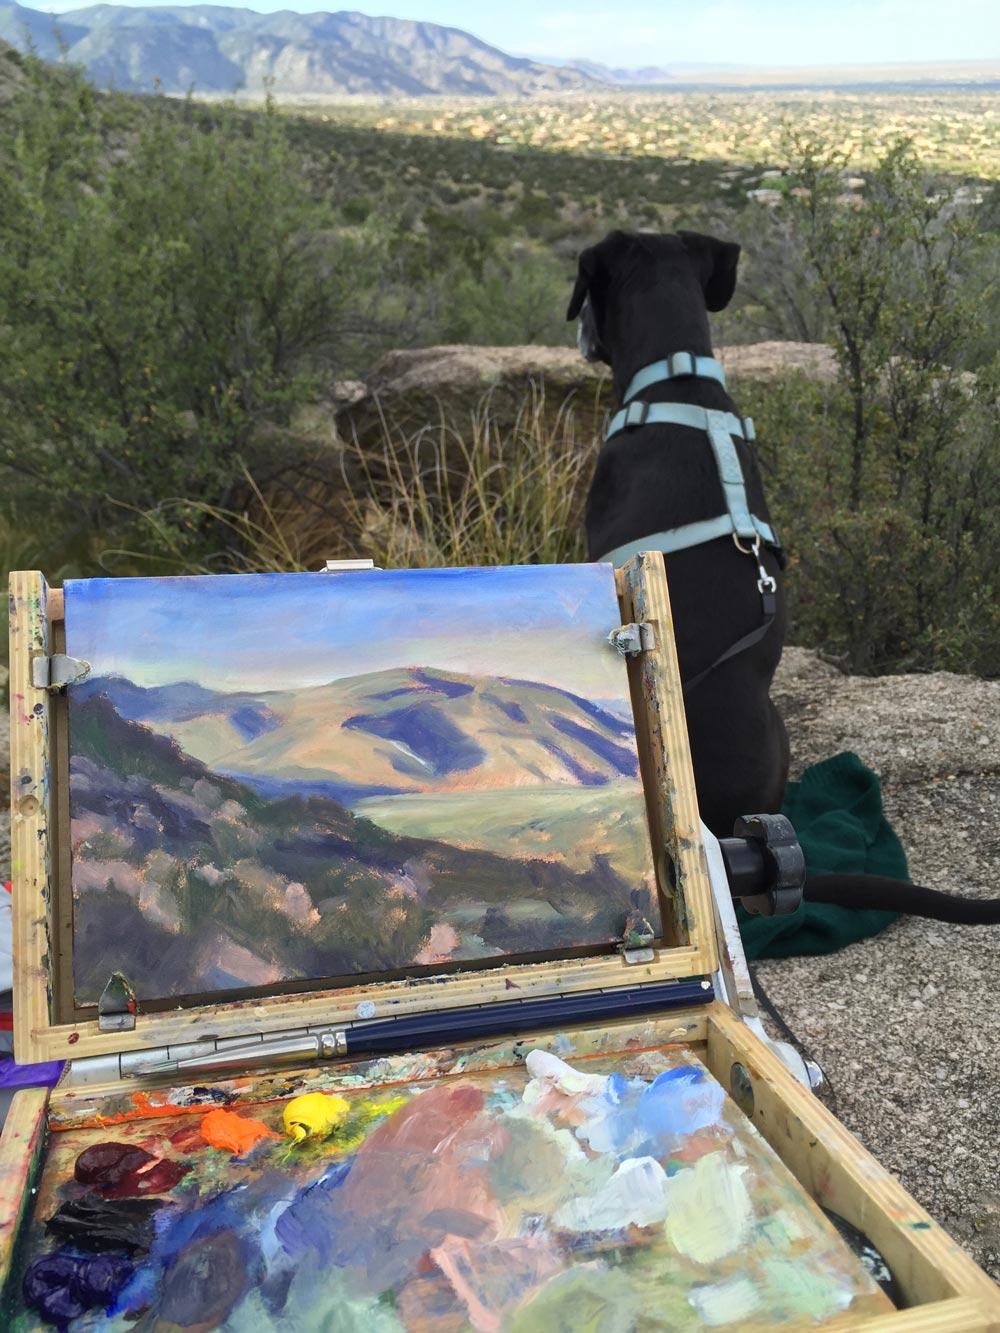 artist Dawn Chandler painting en plain air at la cueva picnic area above albuquerque with her brave companion standing guard